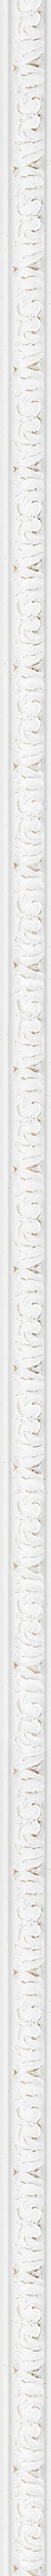 Carved white decape frame frame